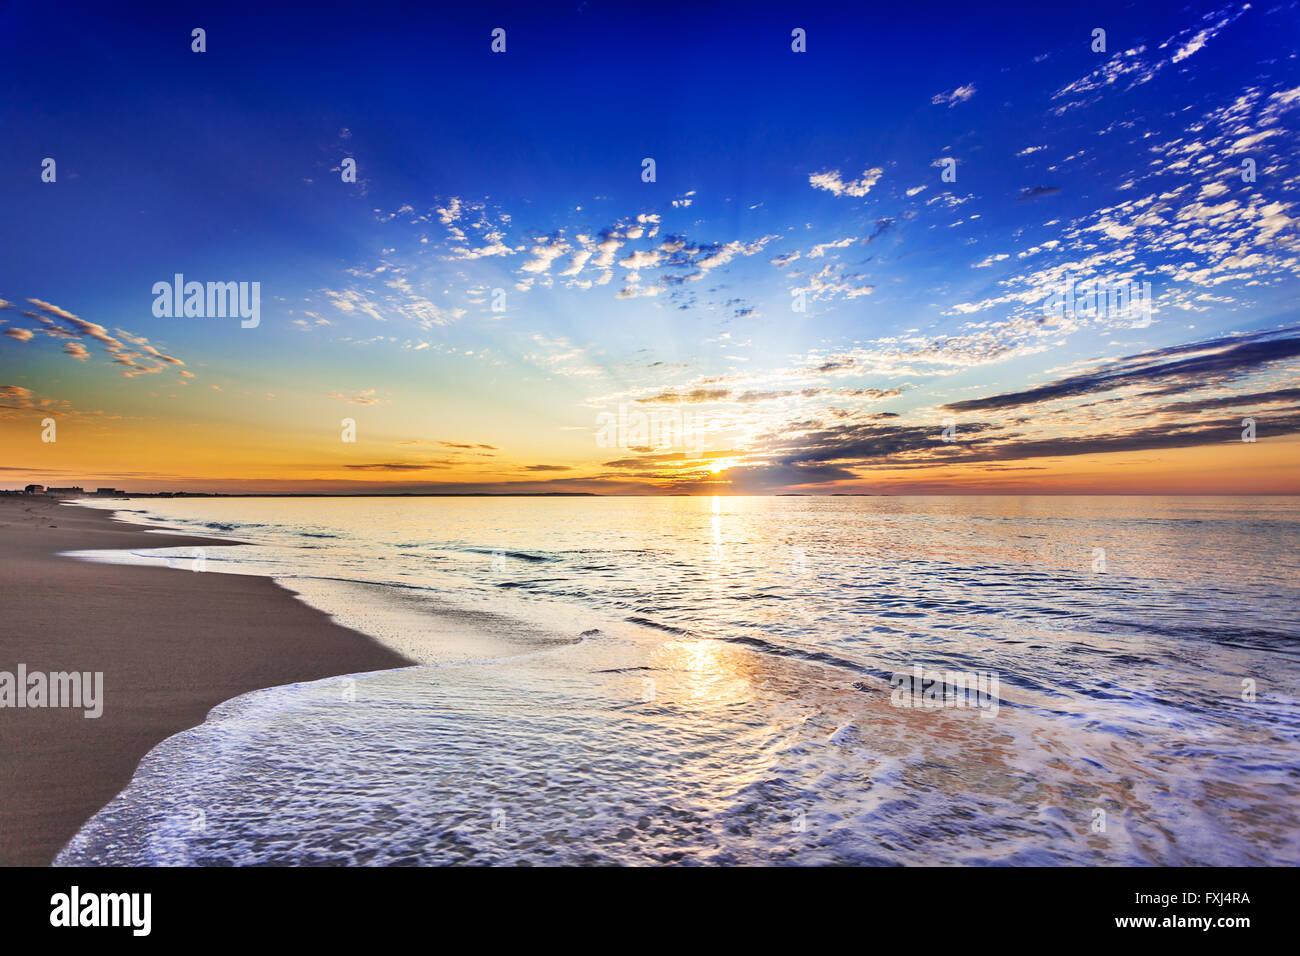 Rising sun over Ocean Park - Stock Image